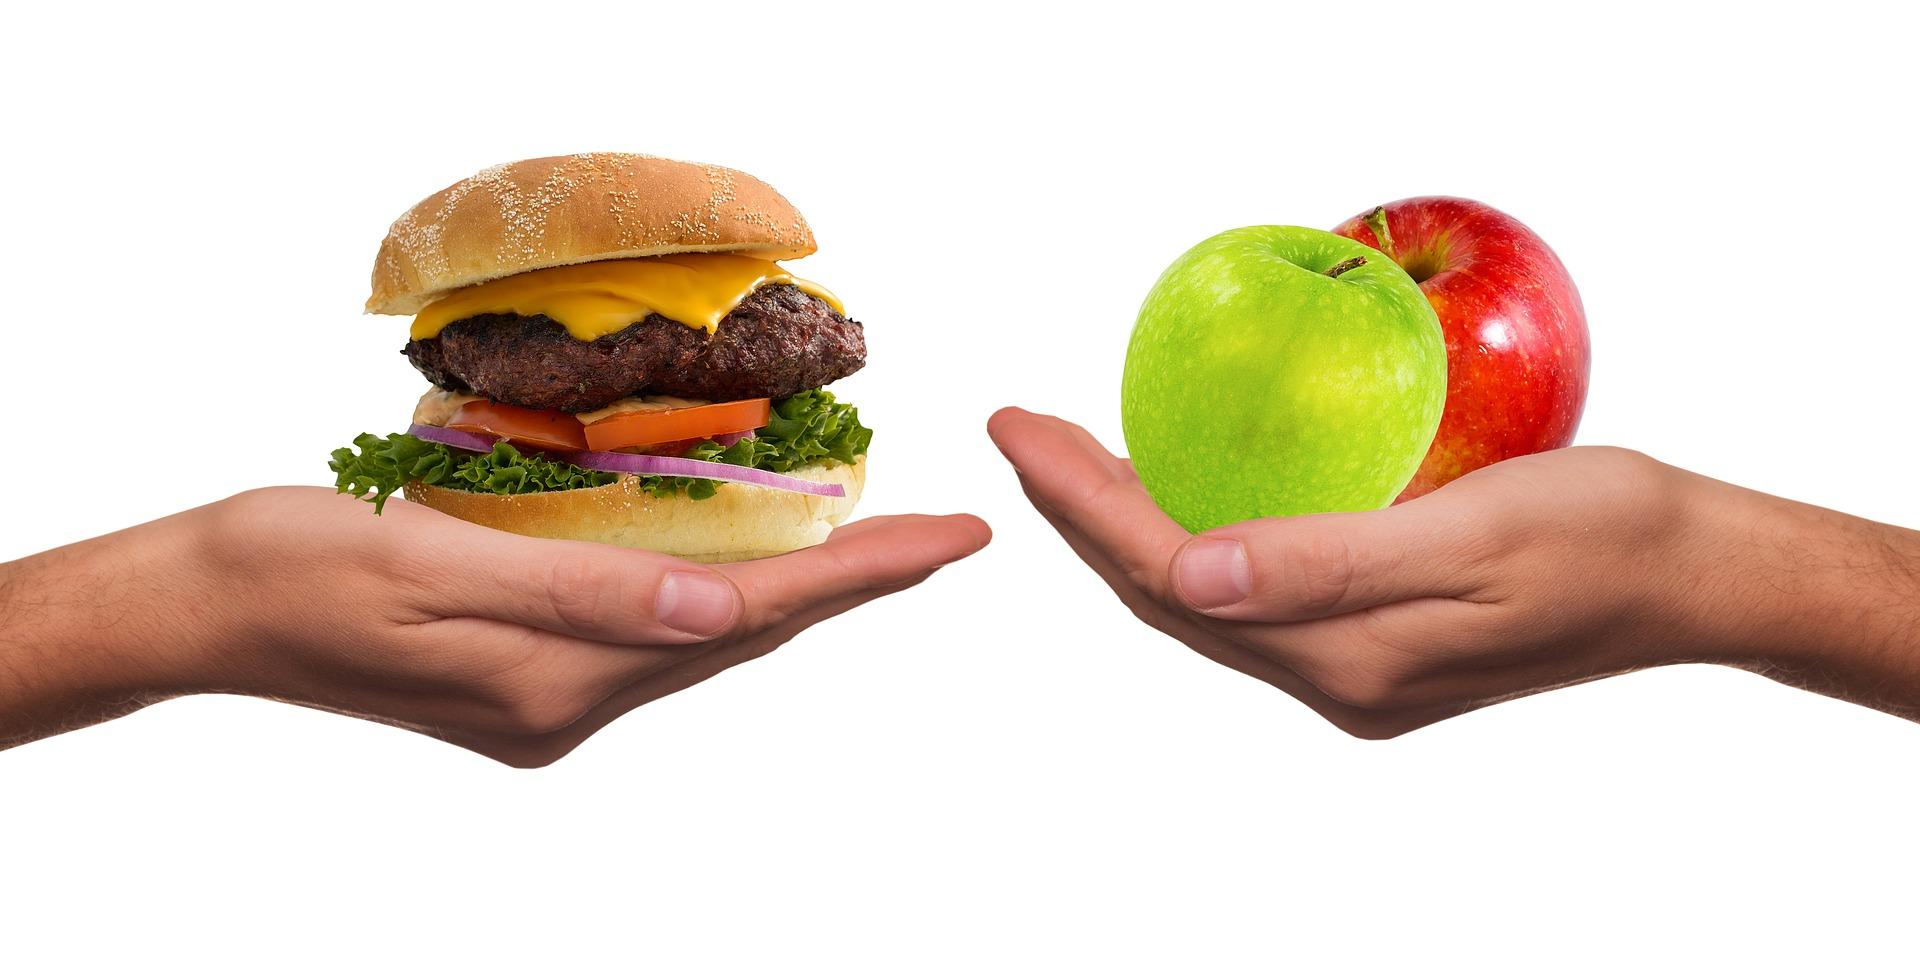 Comida sana versus comida rápida